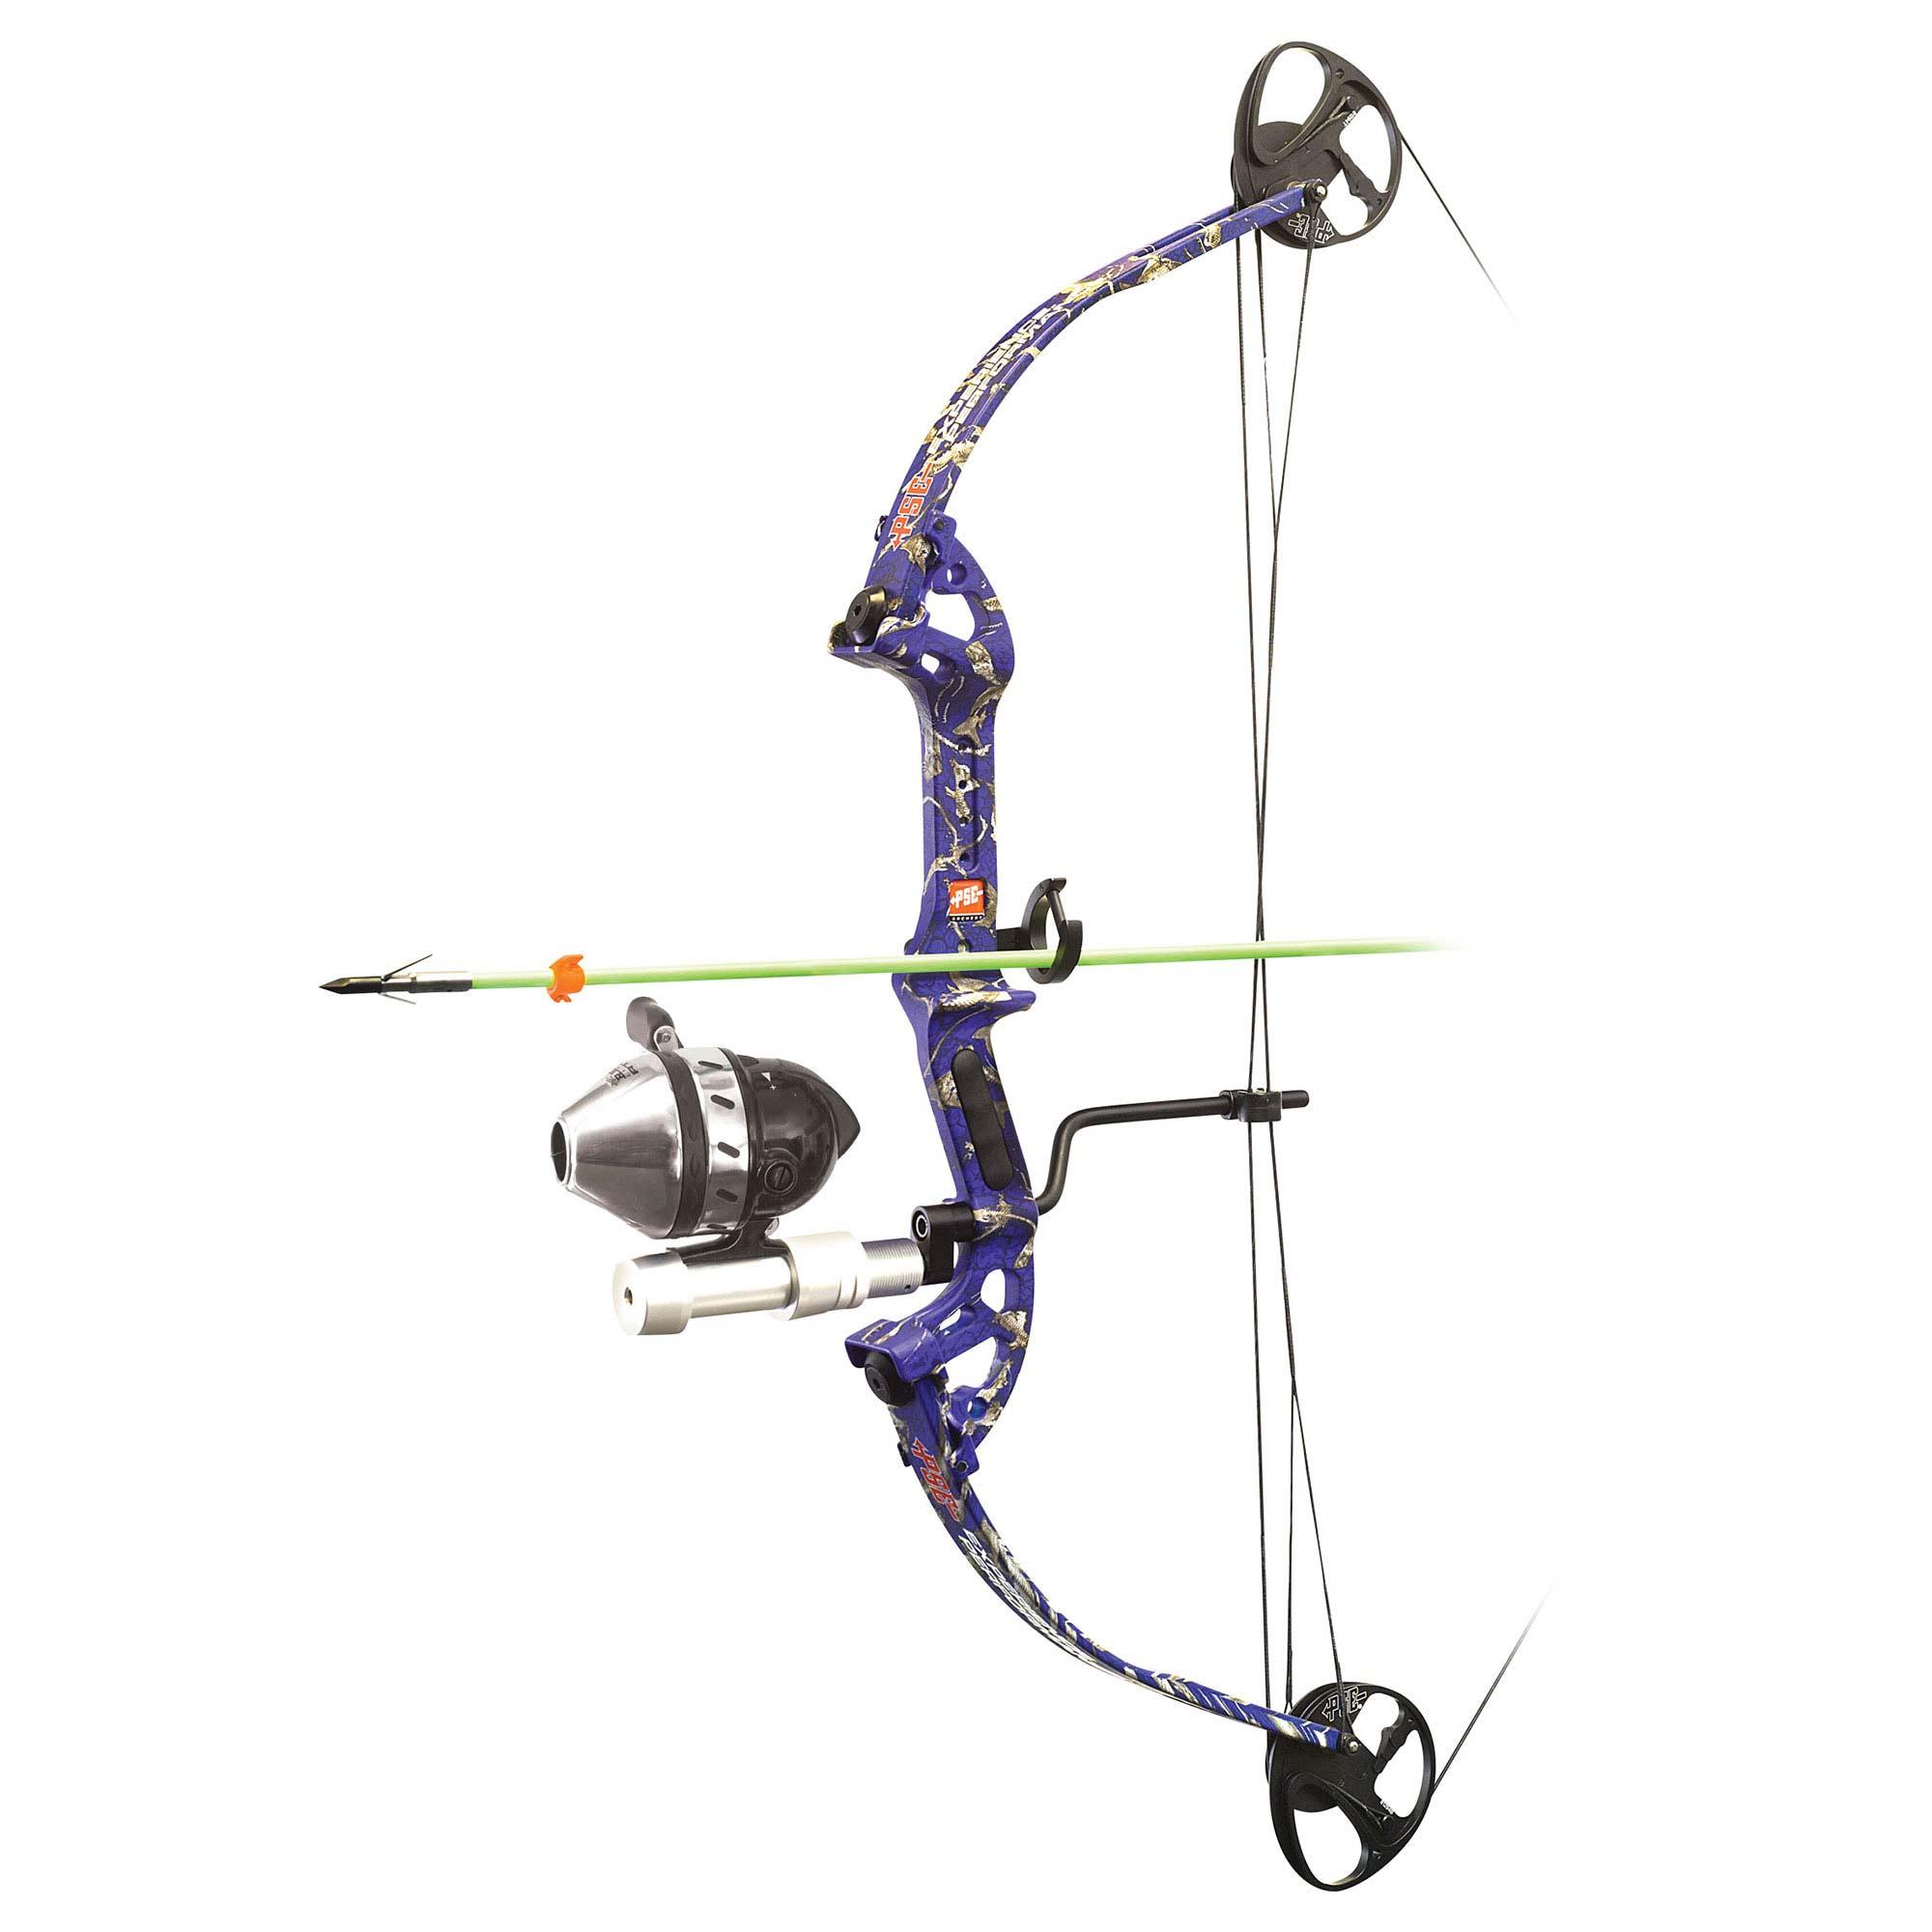 Hunting > Archery > Bowfishing